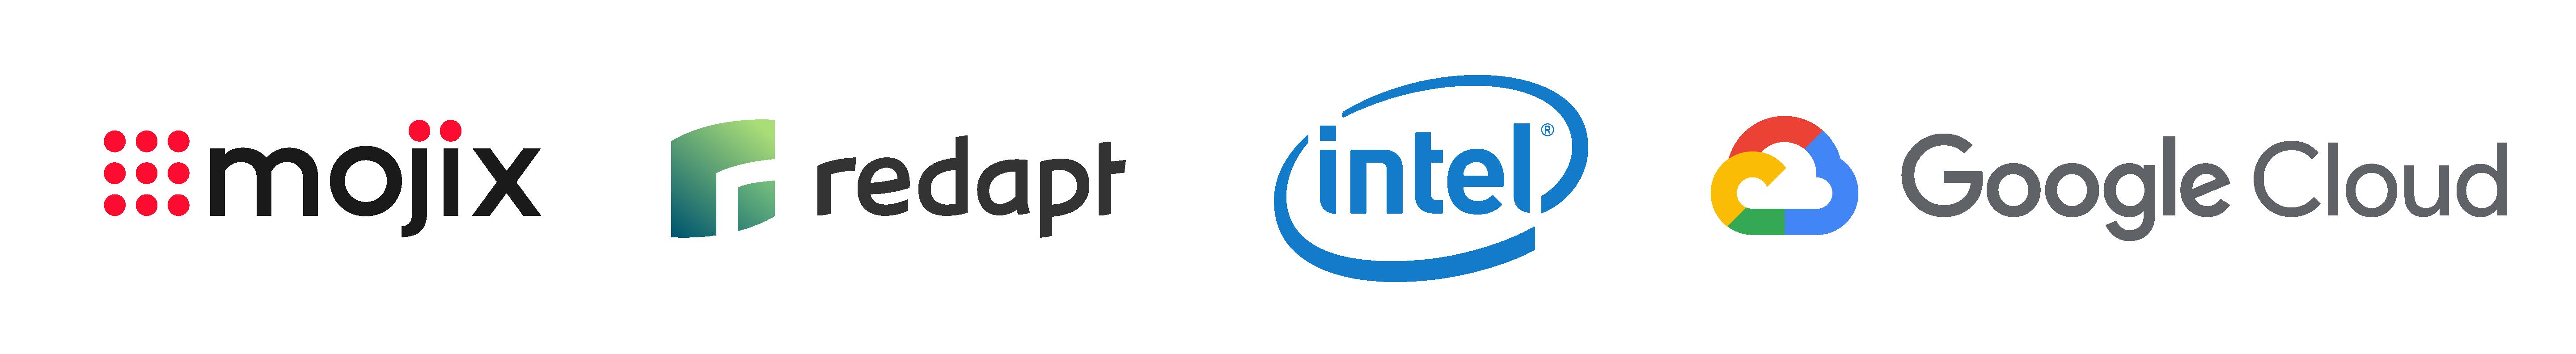 logo_group